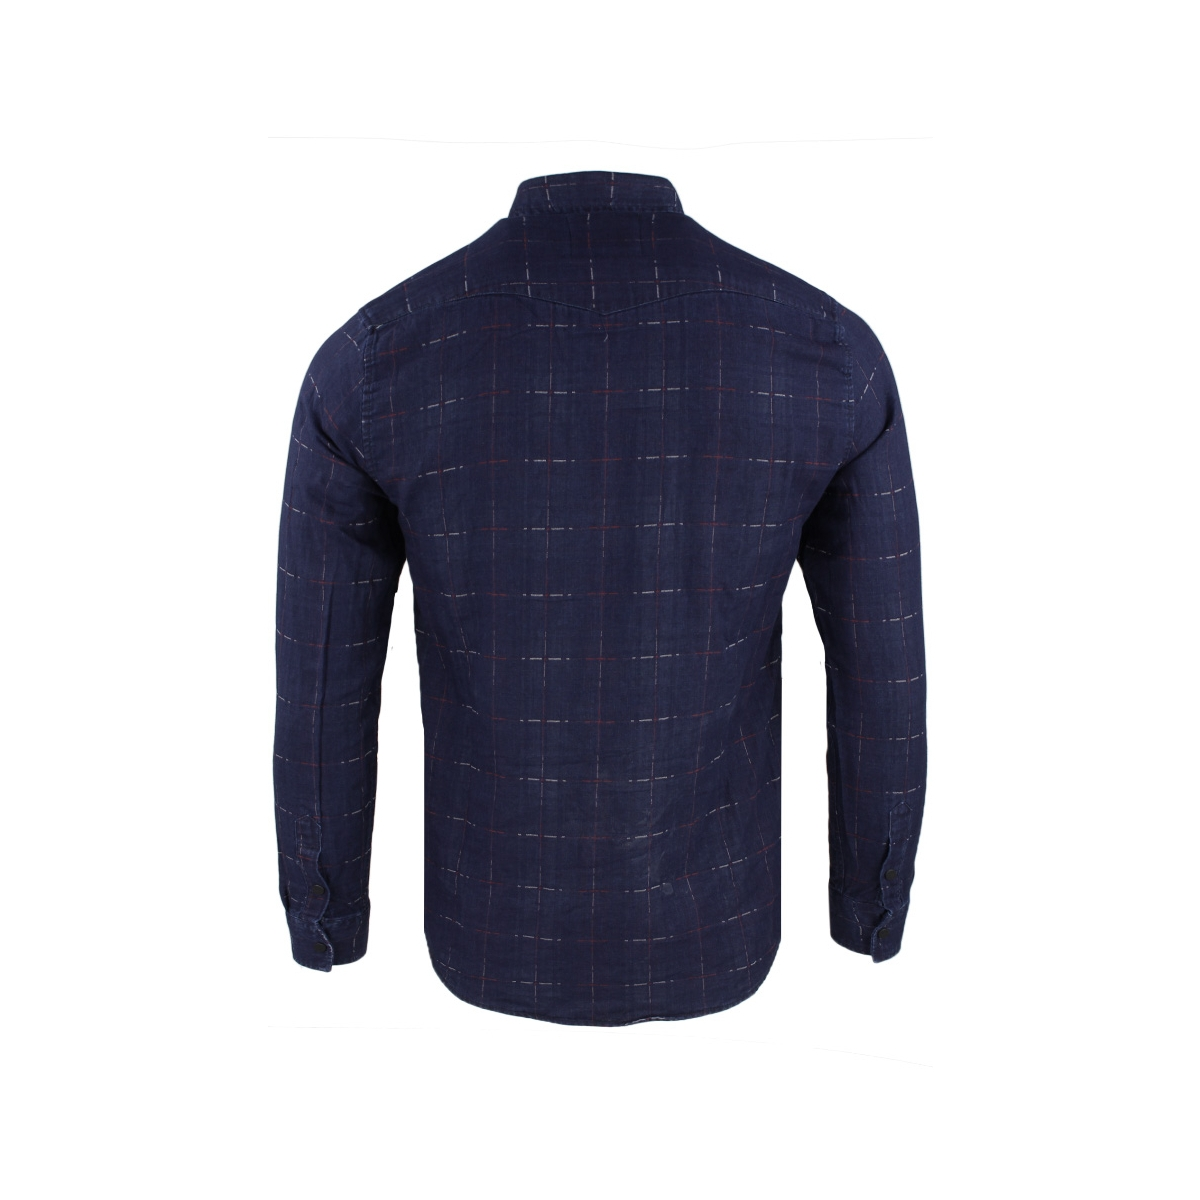 denim shirt 33831 gabbiano overhemd denim blue